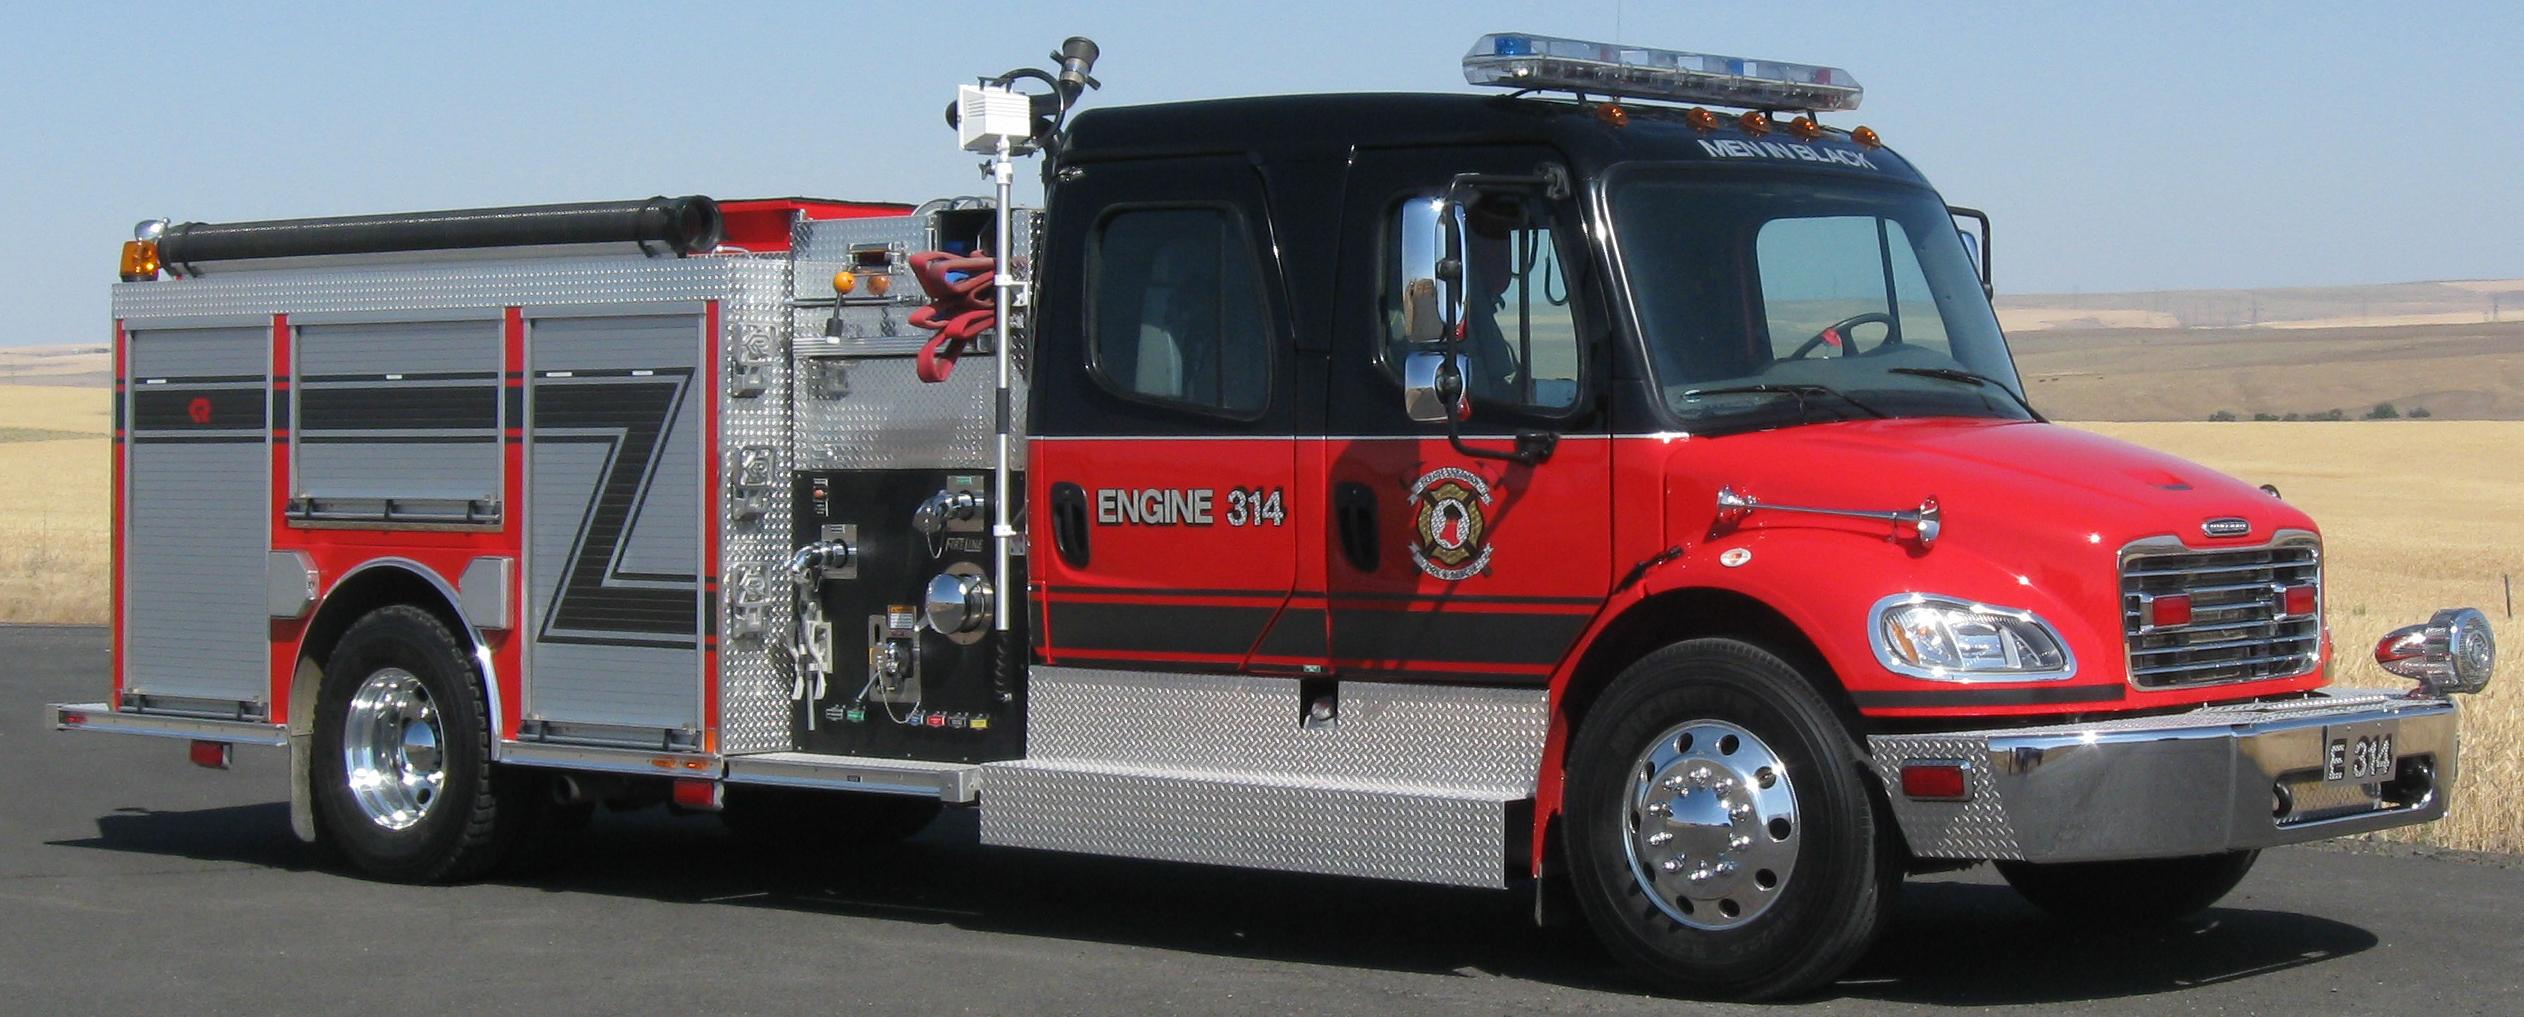 Engine 314